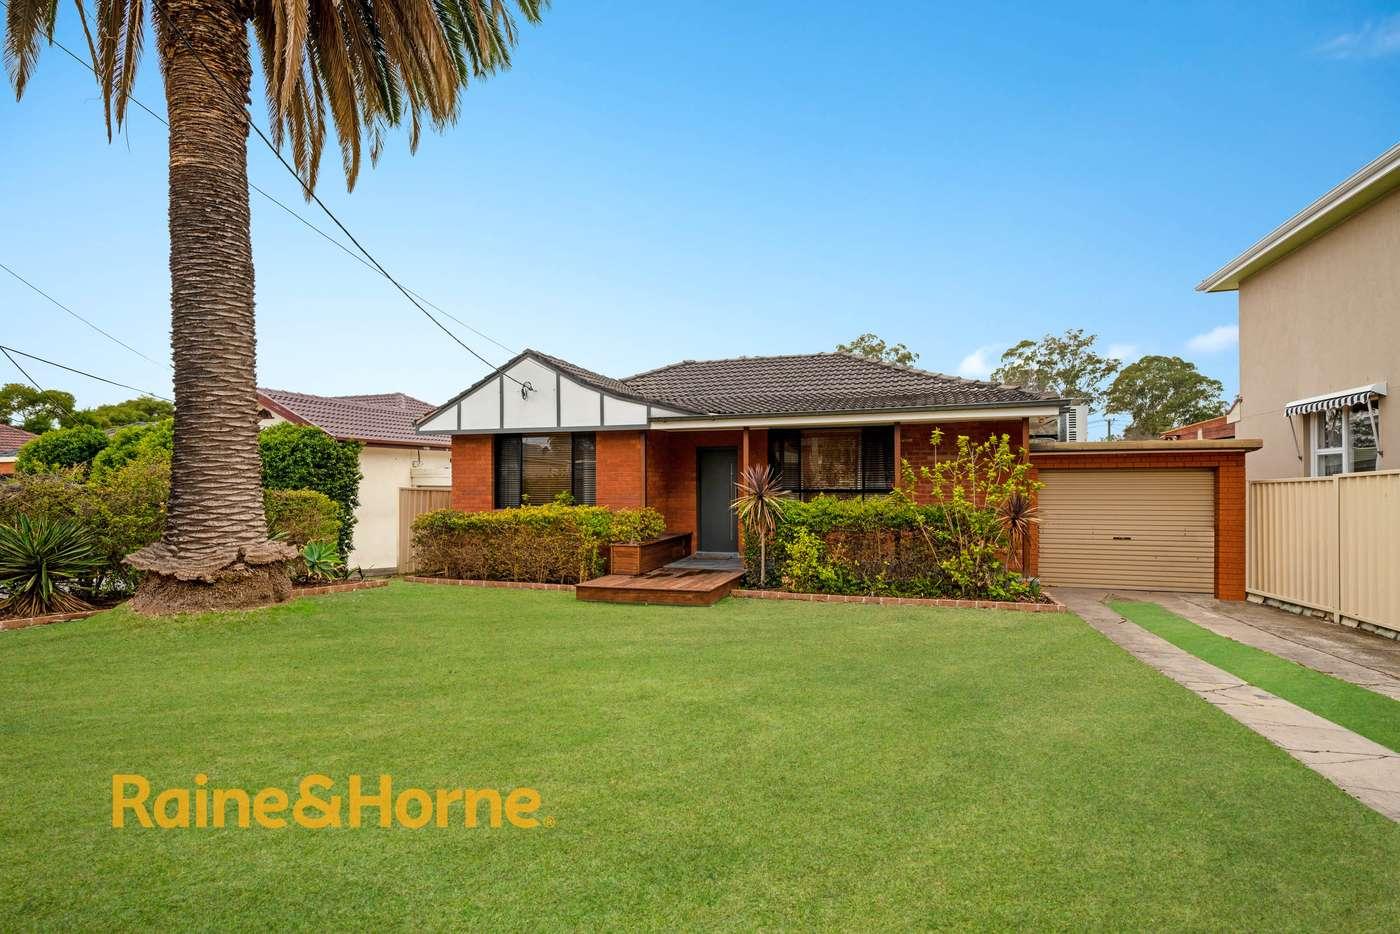 Main view of Homely house listing, 20 Elliott Street, Kingswood NSW 2747